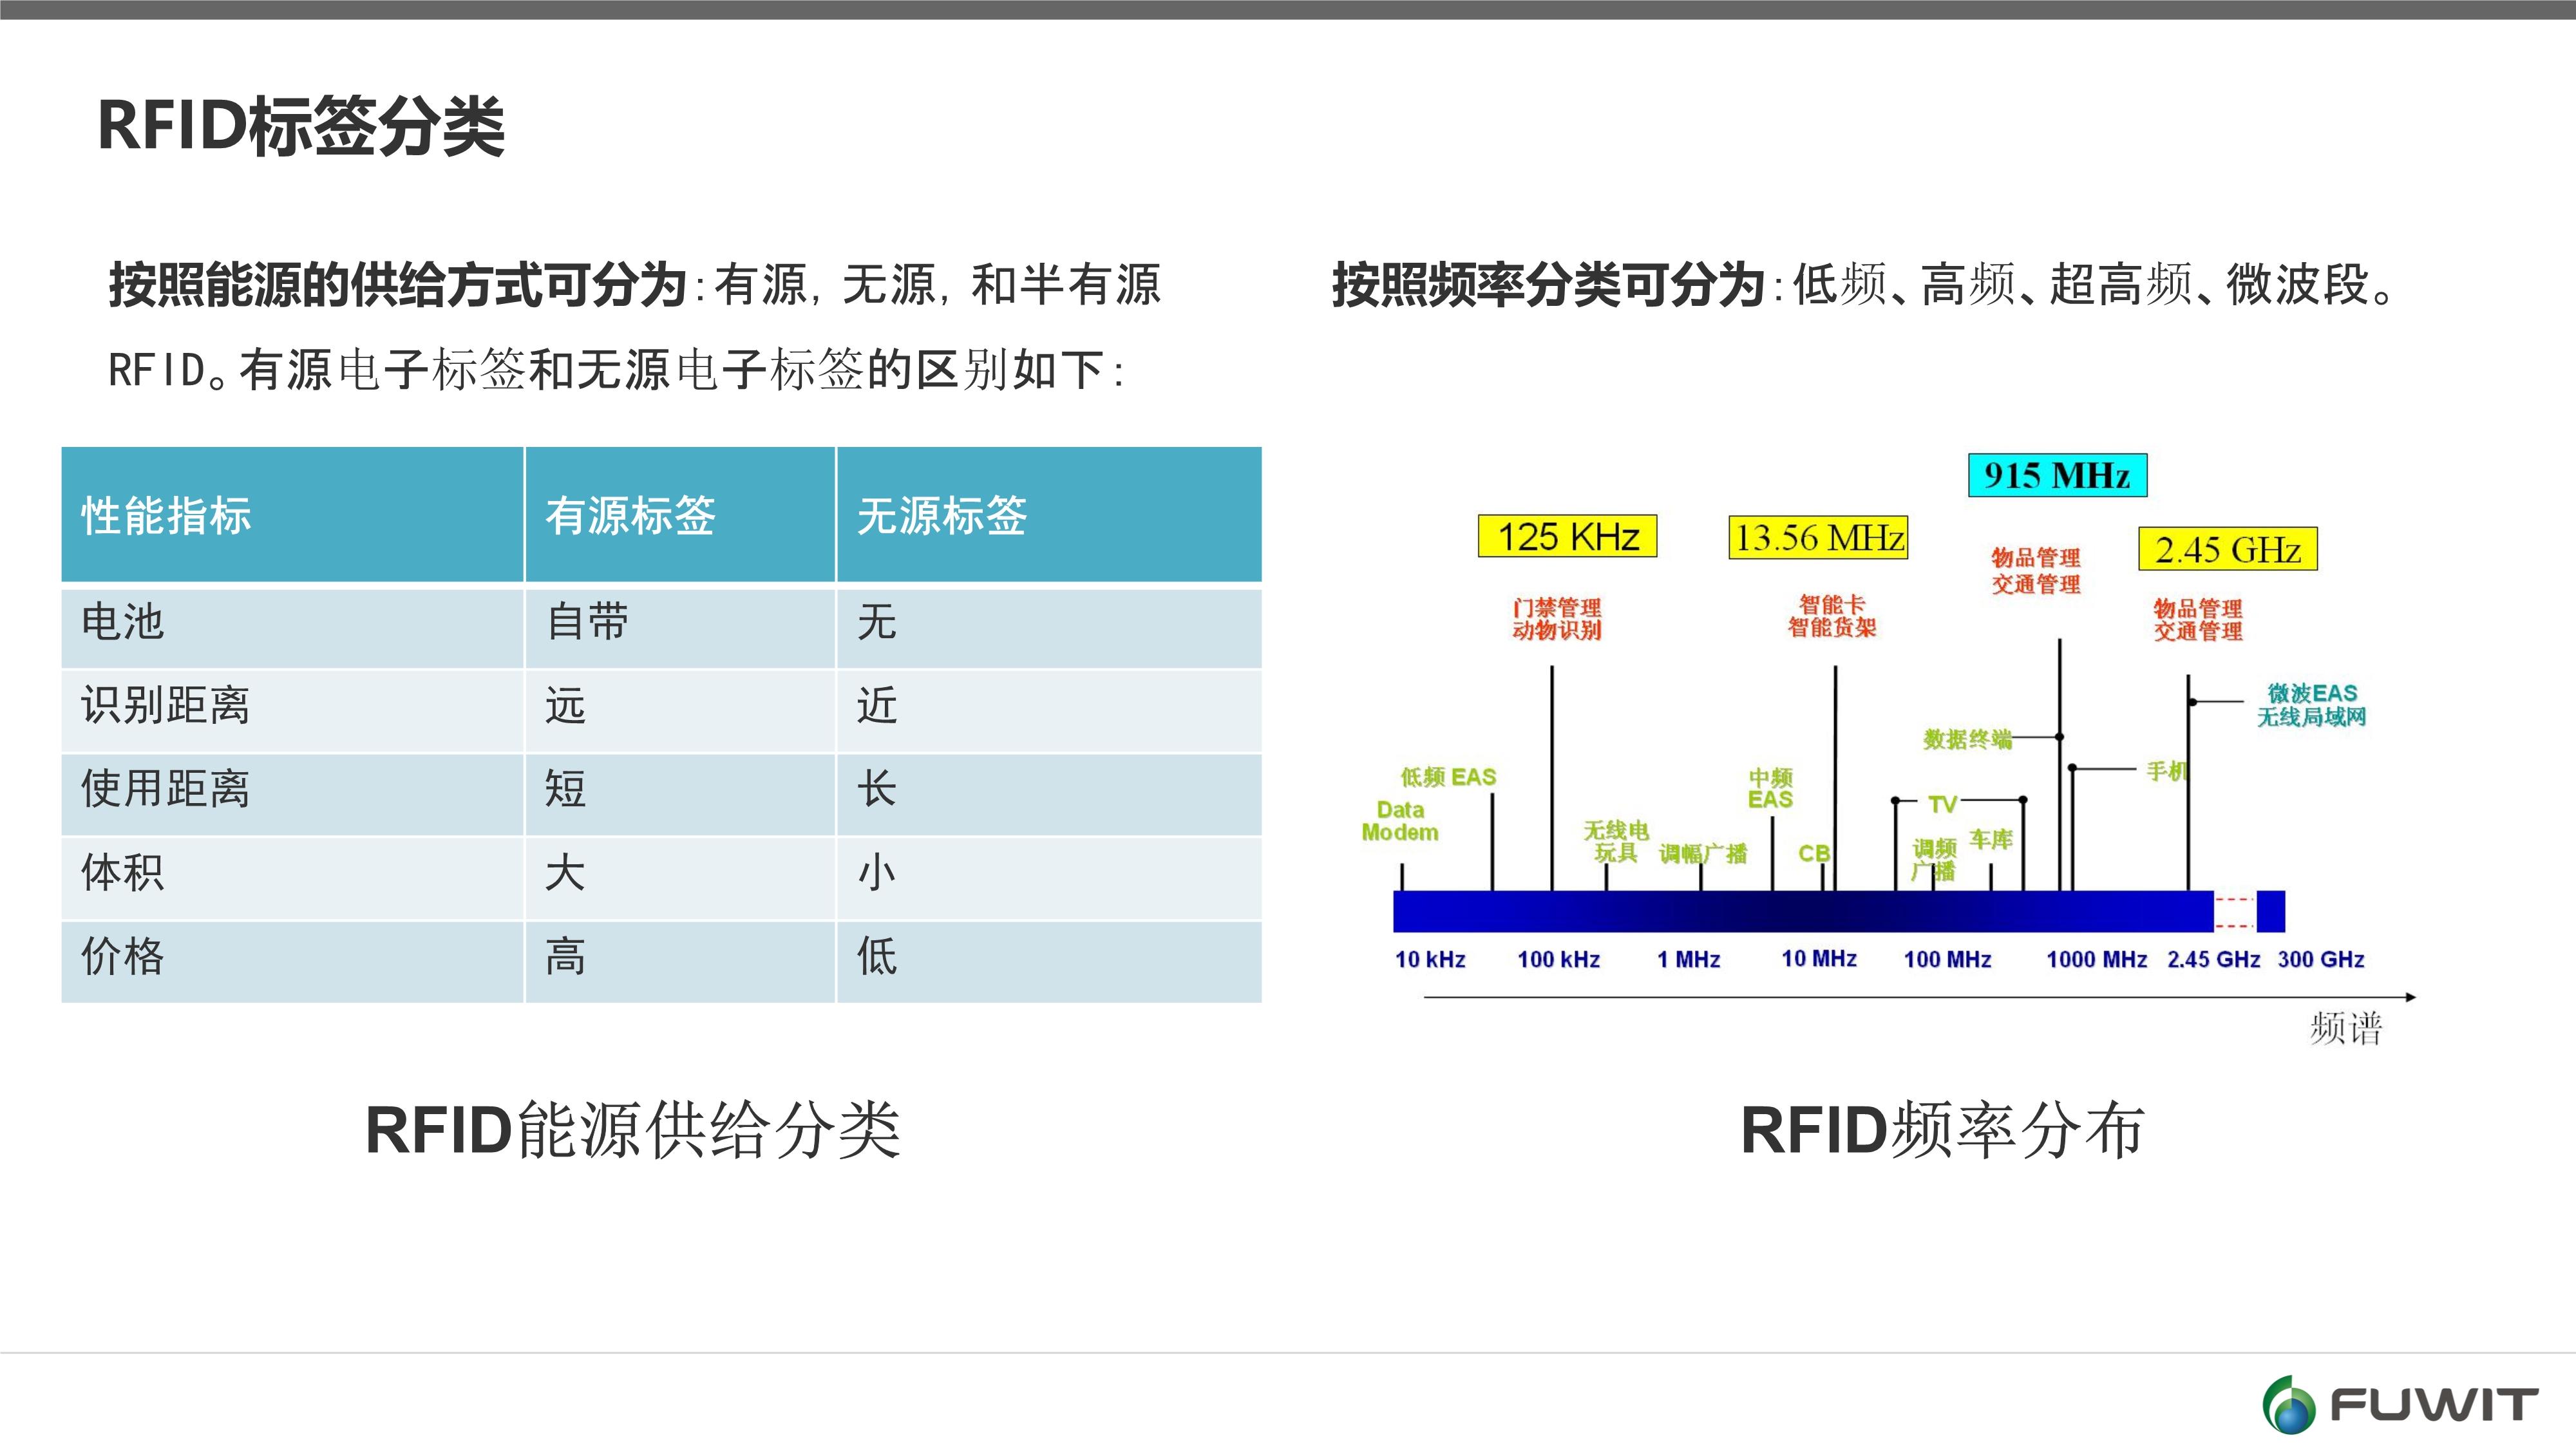 RFID标签频率,RFID电子标签,超高频RFID